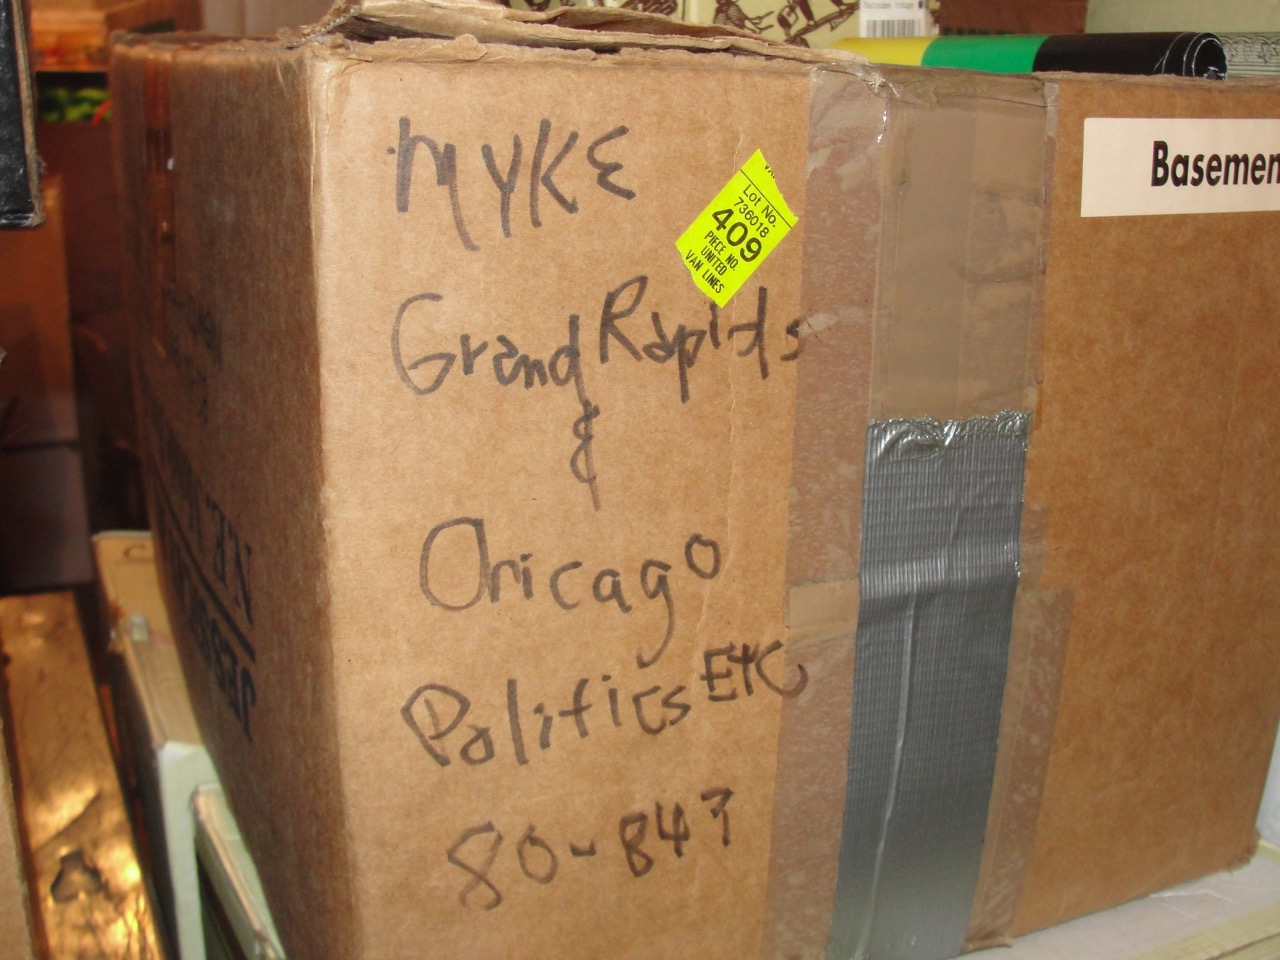 Grand Rapids Political work